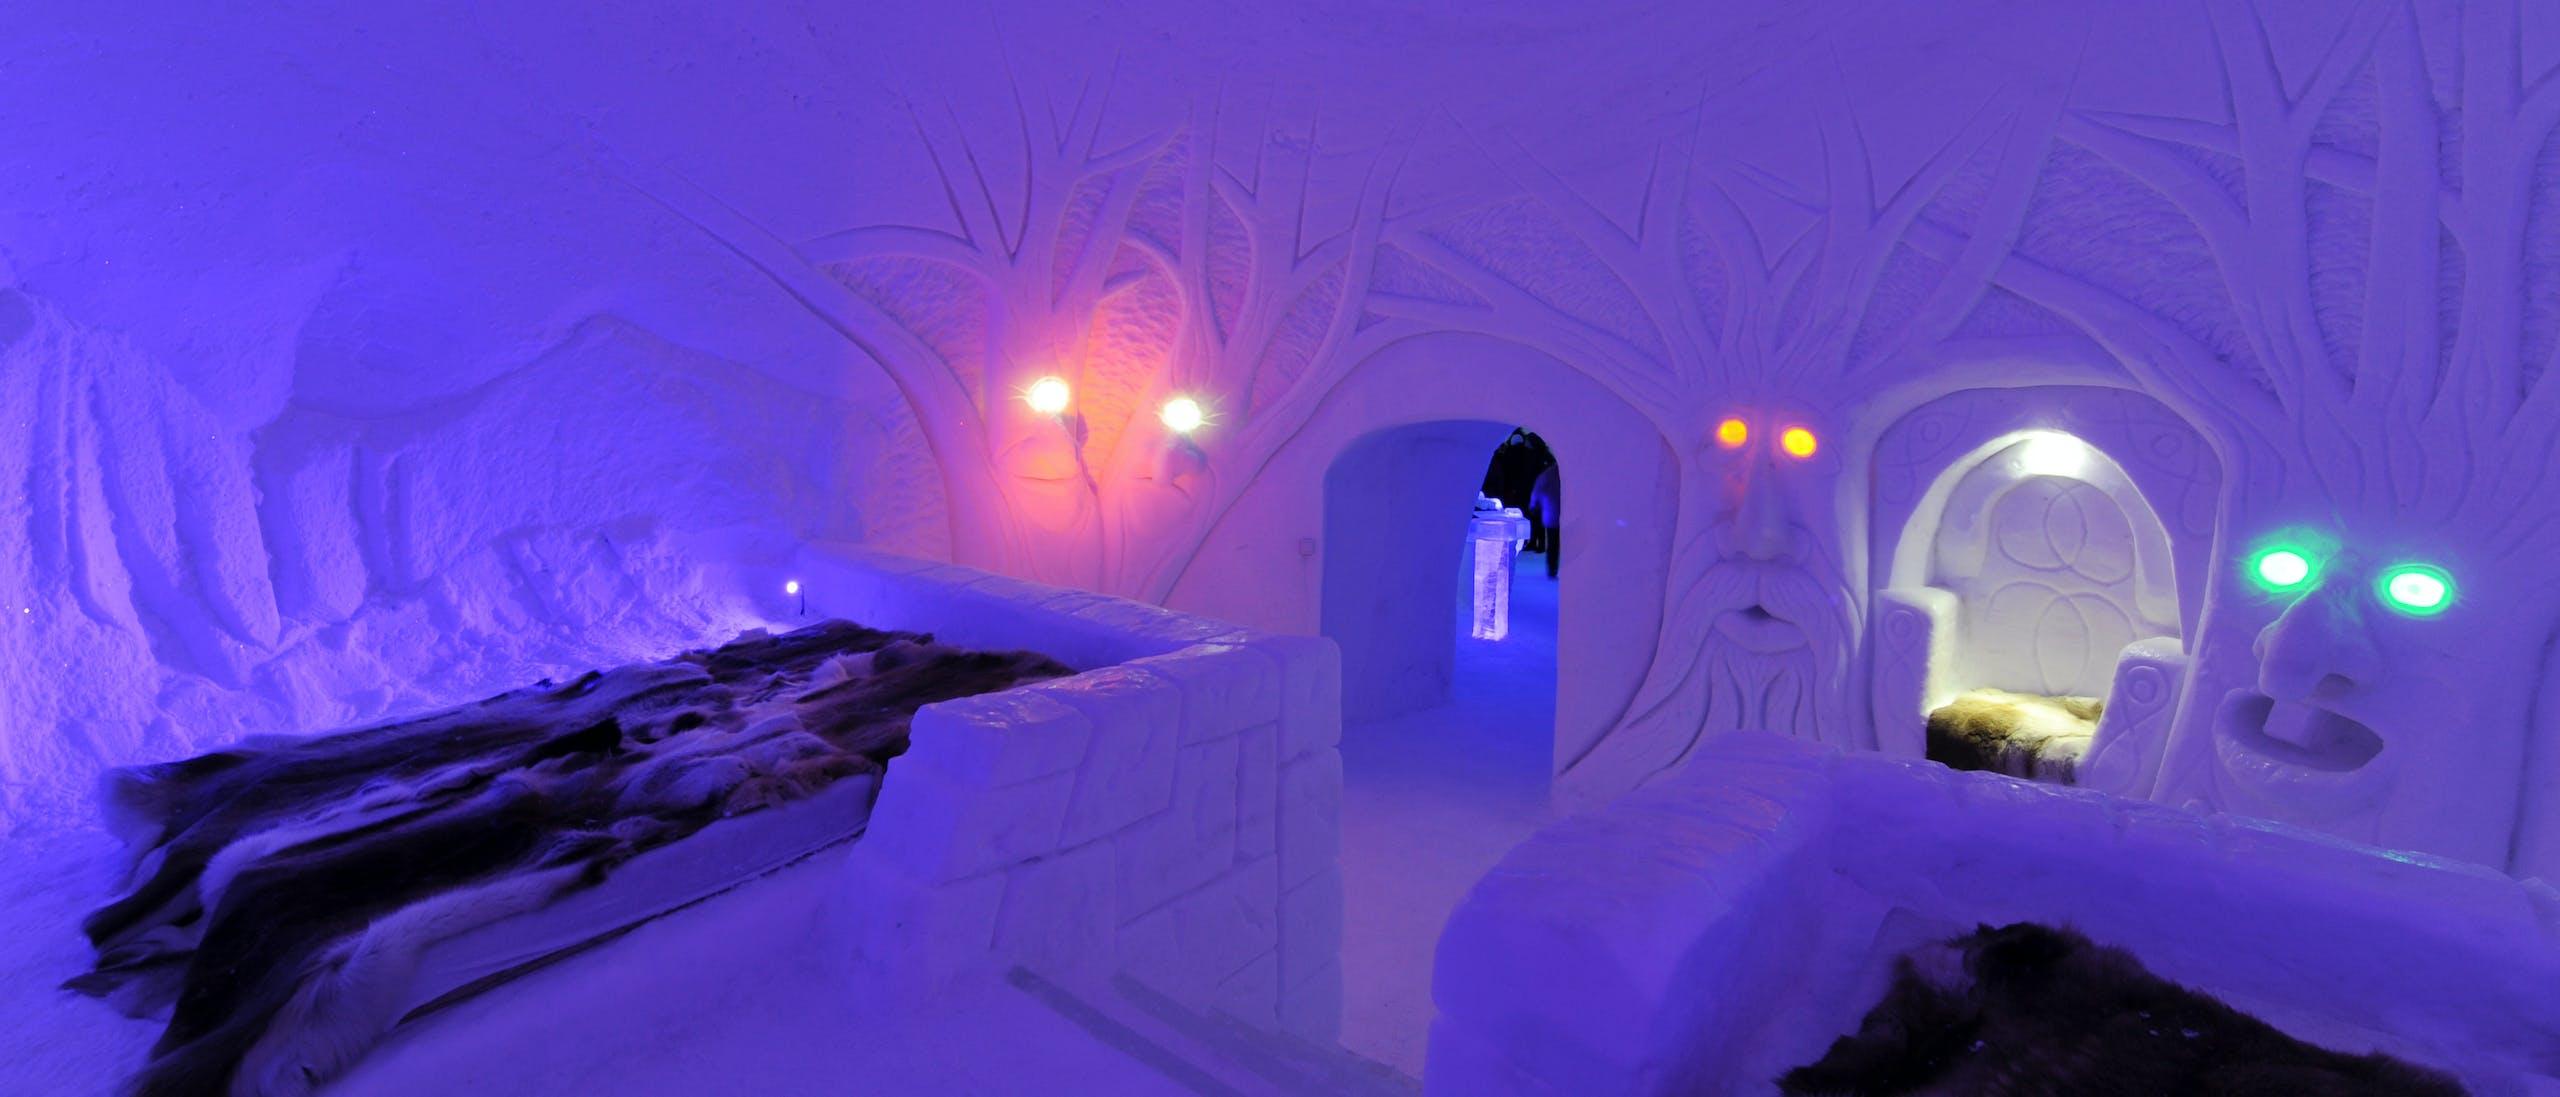 Snøhotell Ehz